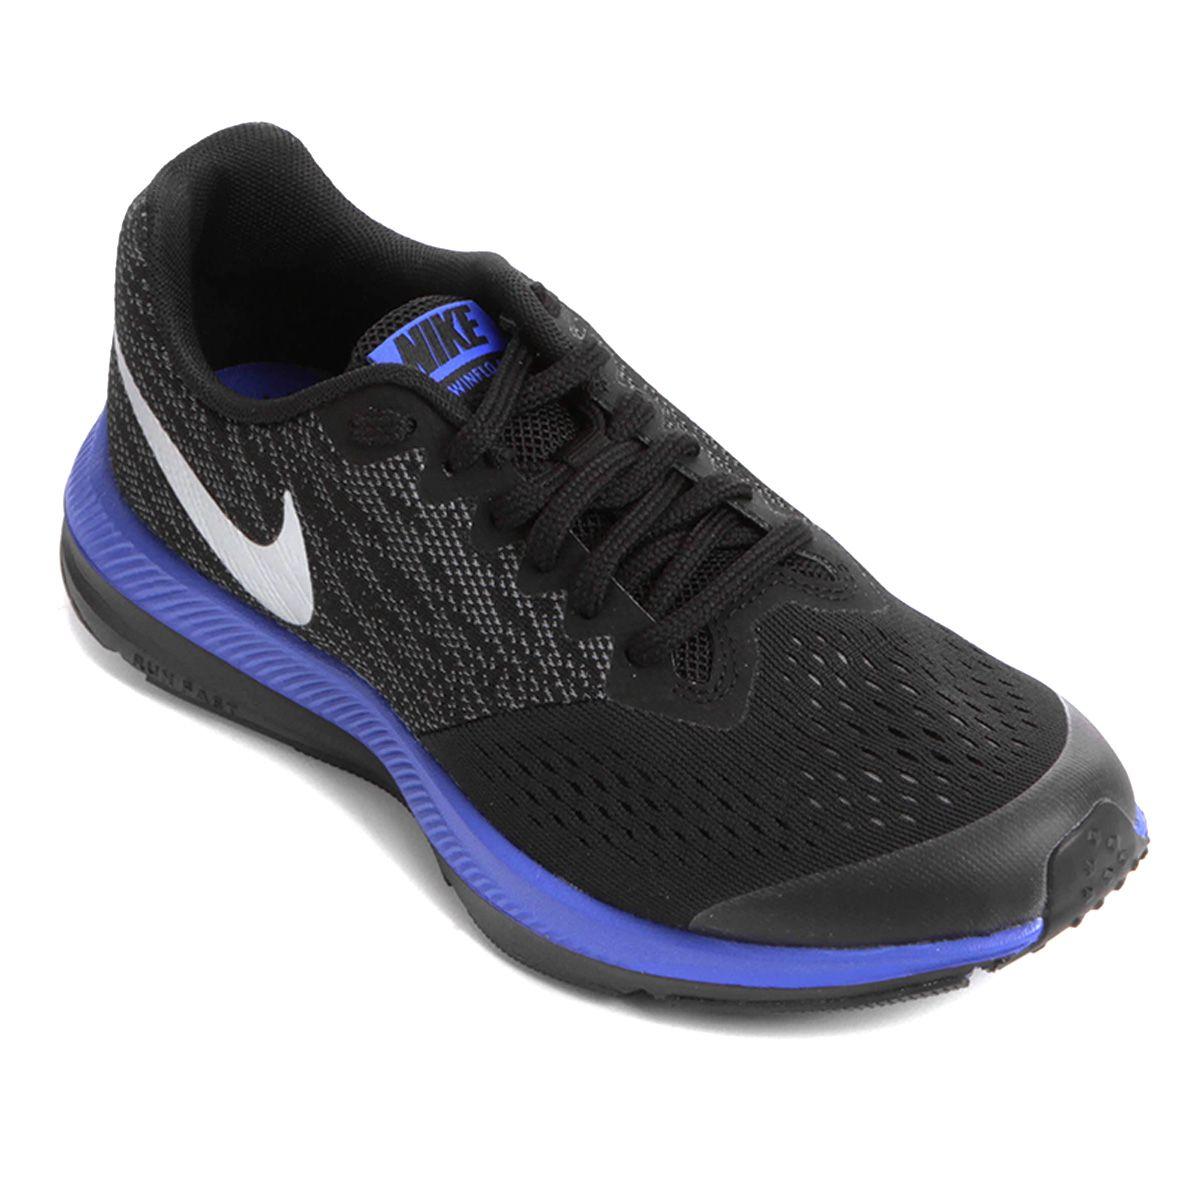 00469c4c42c Tênis Masculino Nike Zoom Winflo 4 - BRACIA SHOP  Loja de Roupas ...